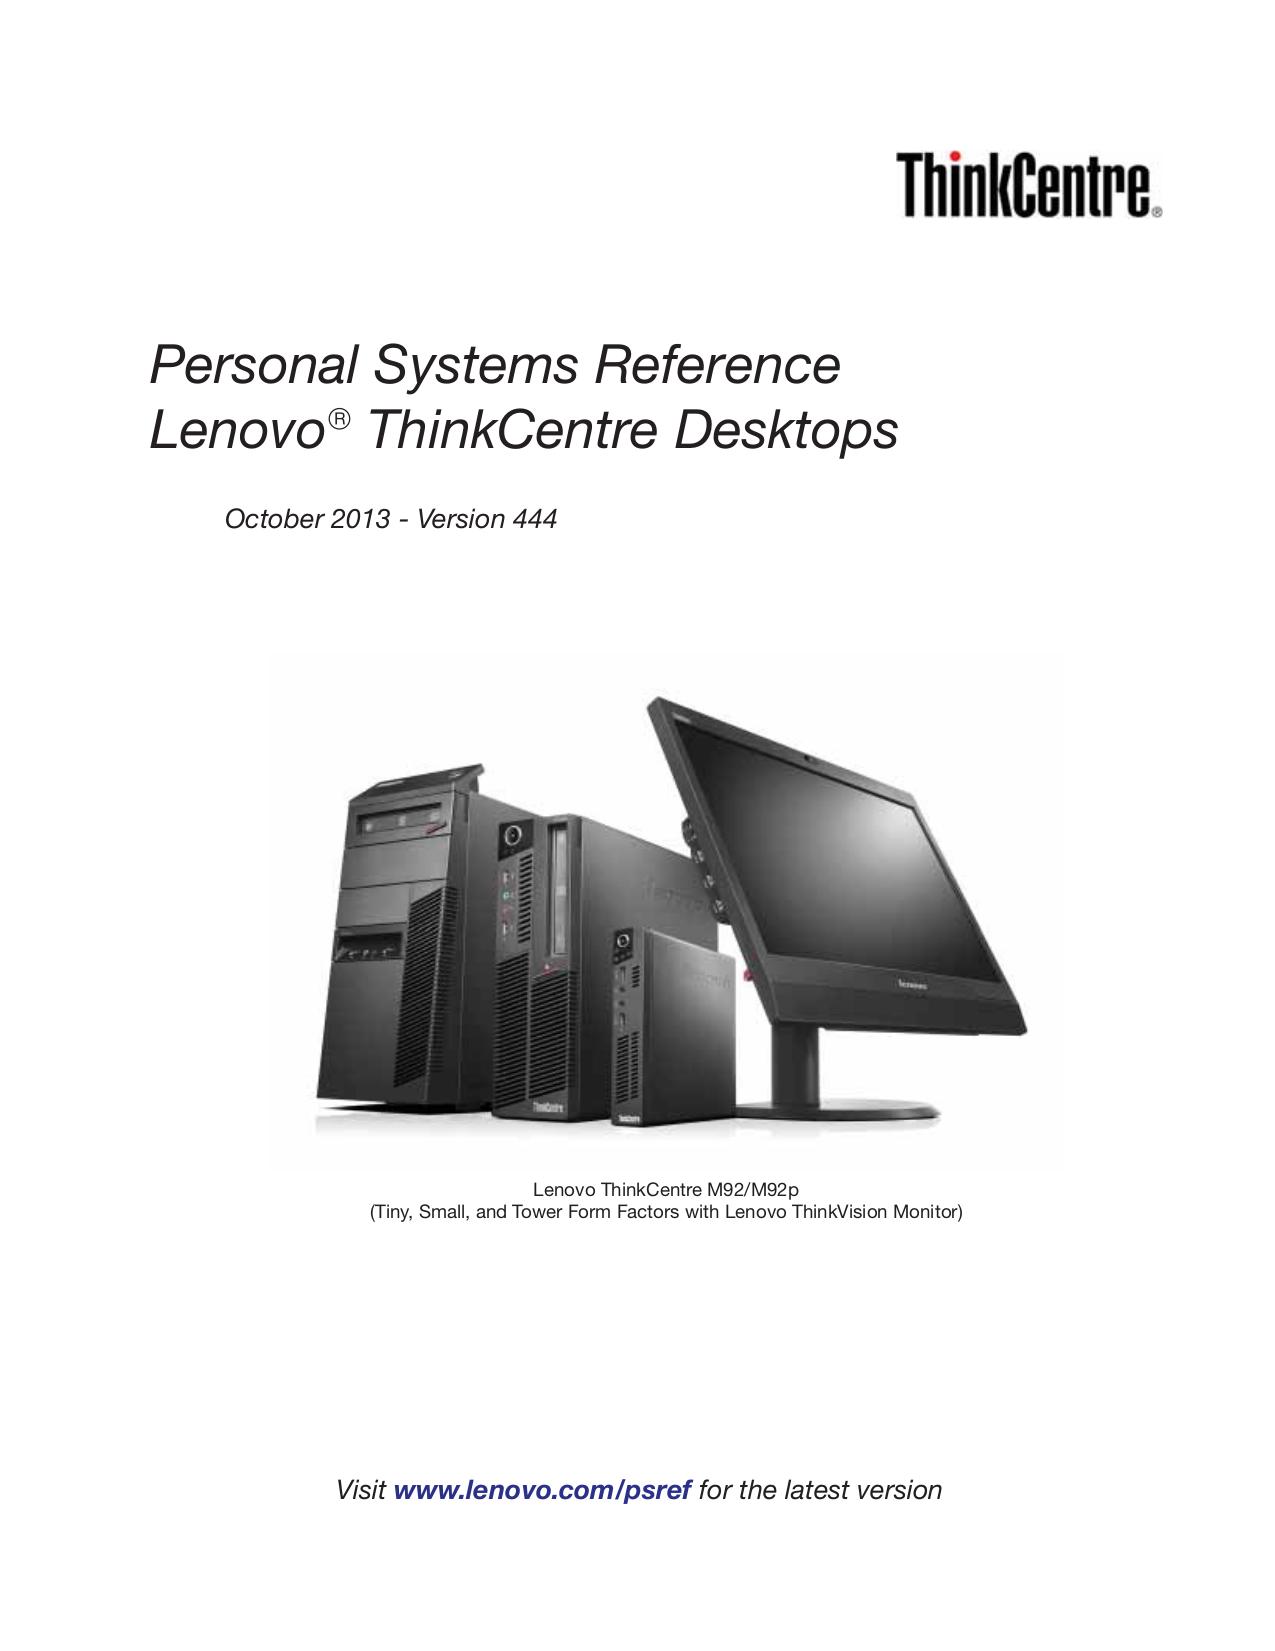 pdf for Lenovo Desktop ThinkCentre M90 3692 manual